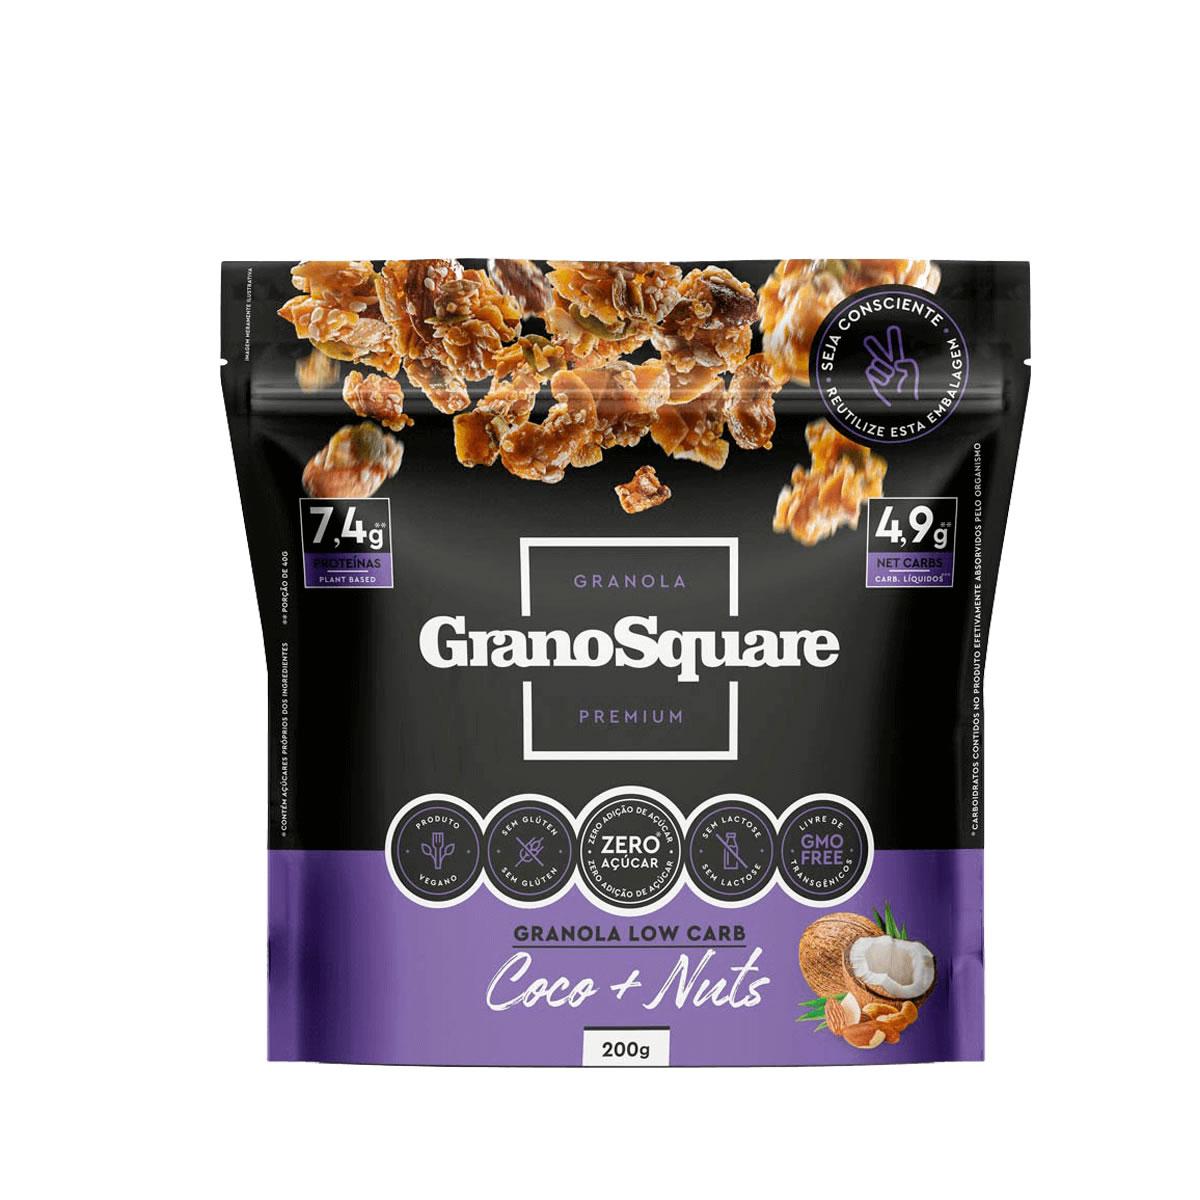 Granola Low Carb Coco com Nuts 200g - GranoSquare